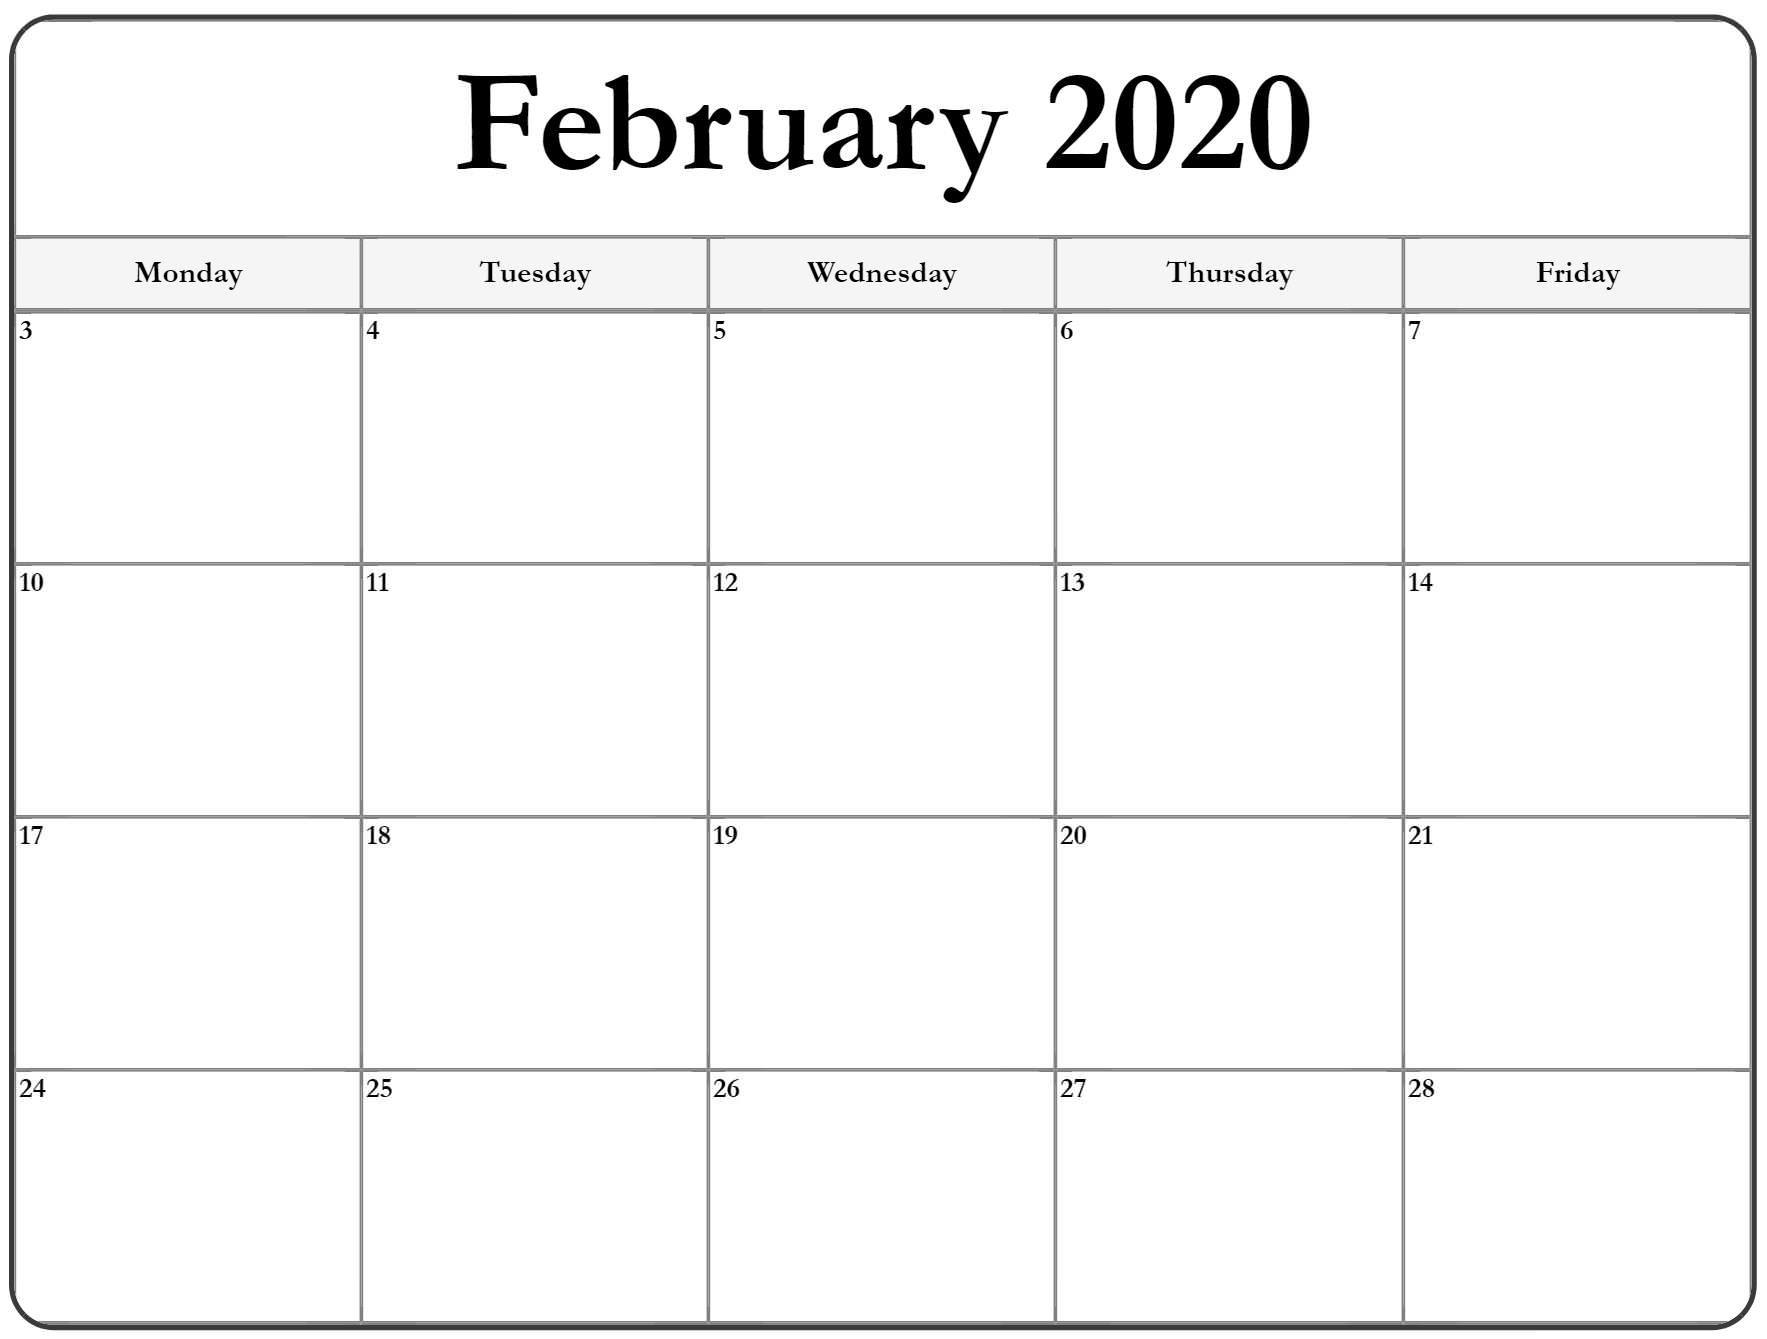 February 2020 Monday Calendar | Monday To Sunday-2020 Calendar Templates Monday - Friday